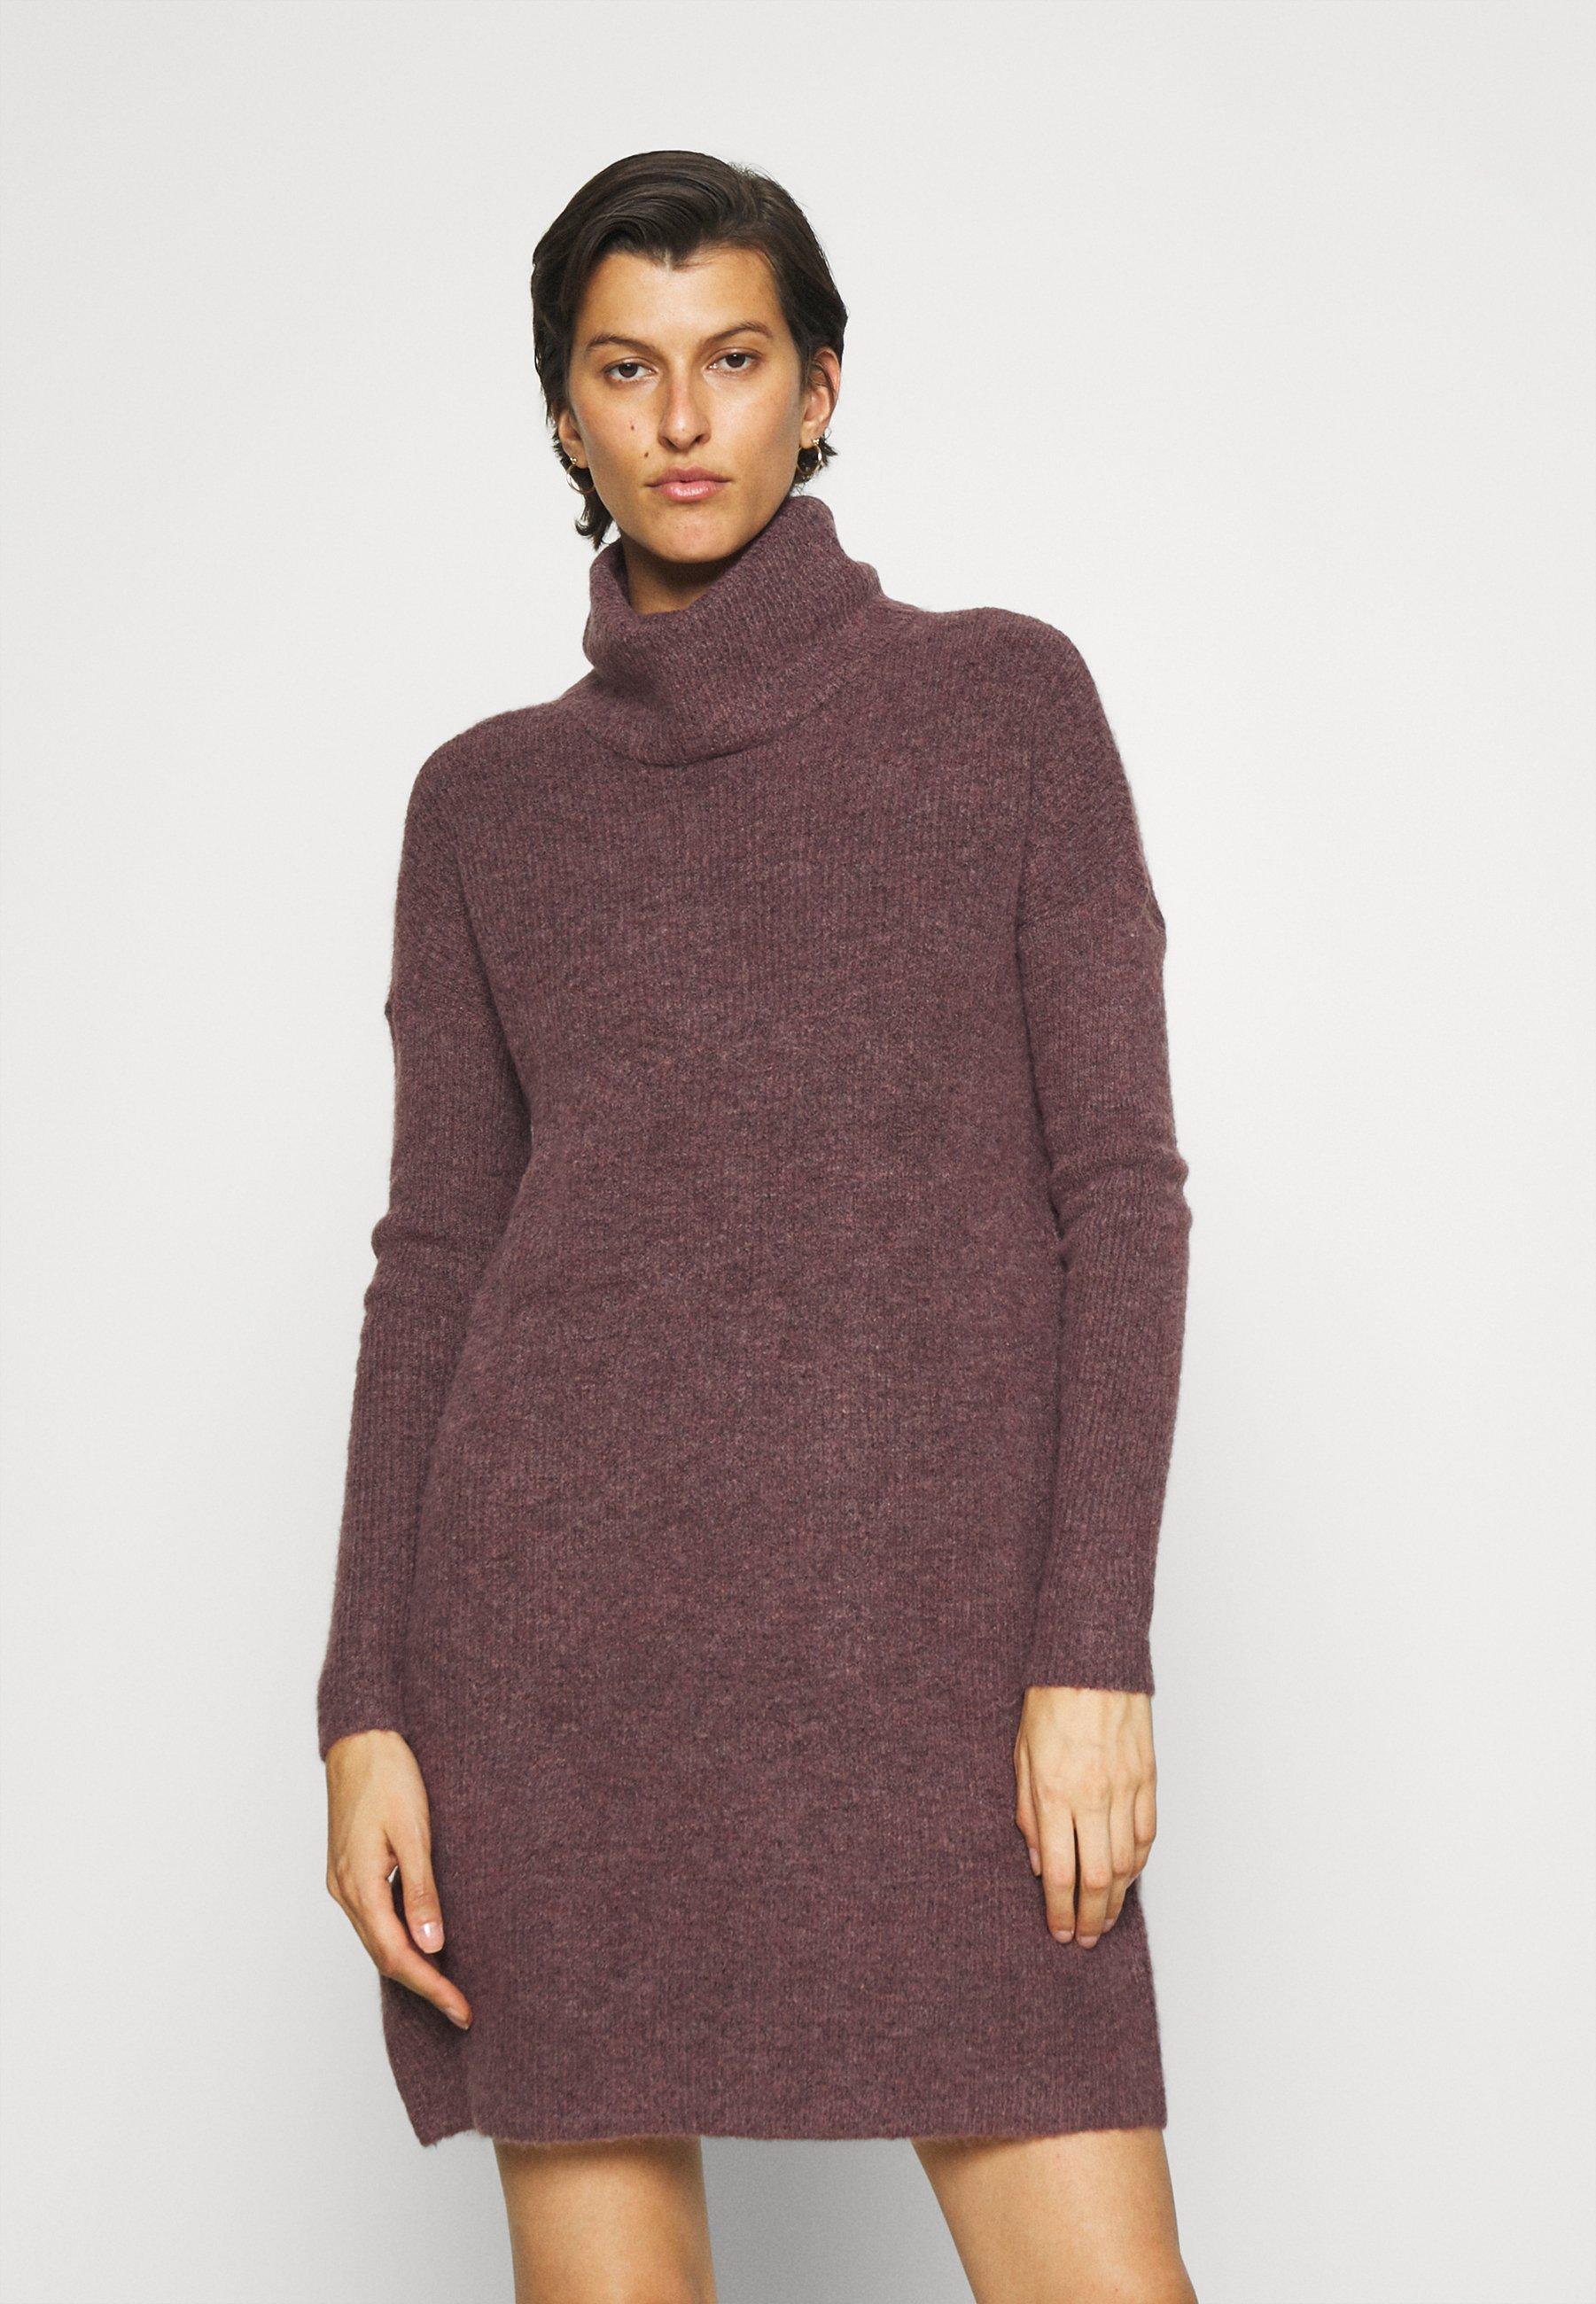 Femme ONLJANA COWLNECK DRESS  - Robe pull